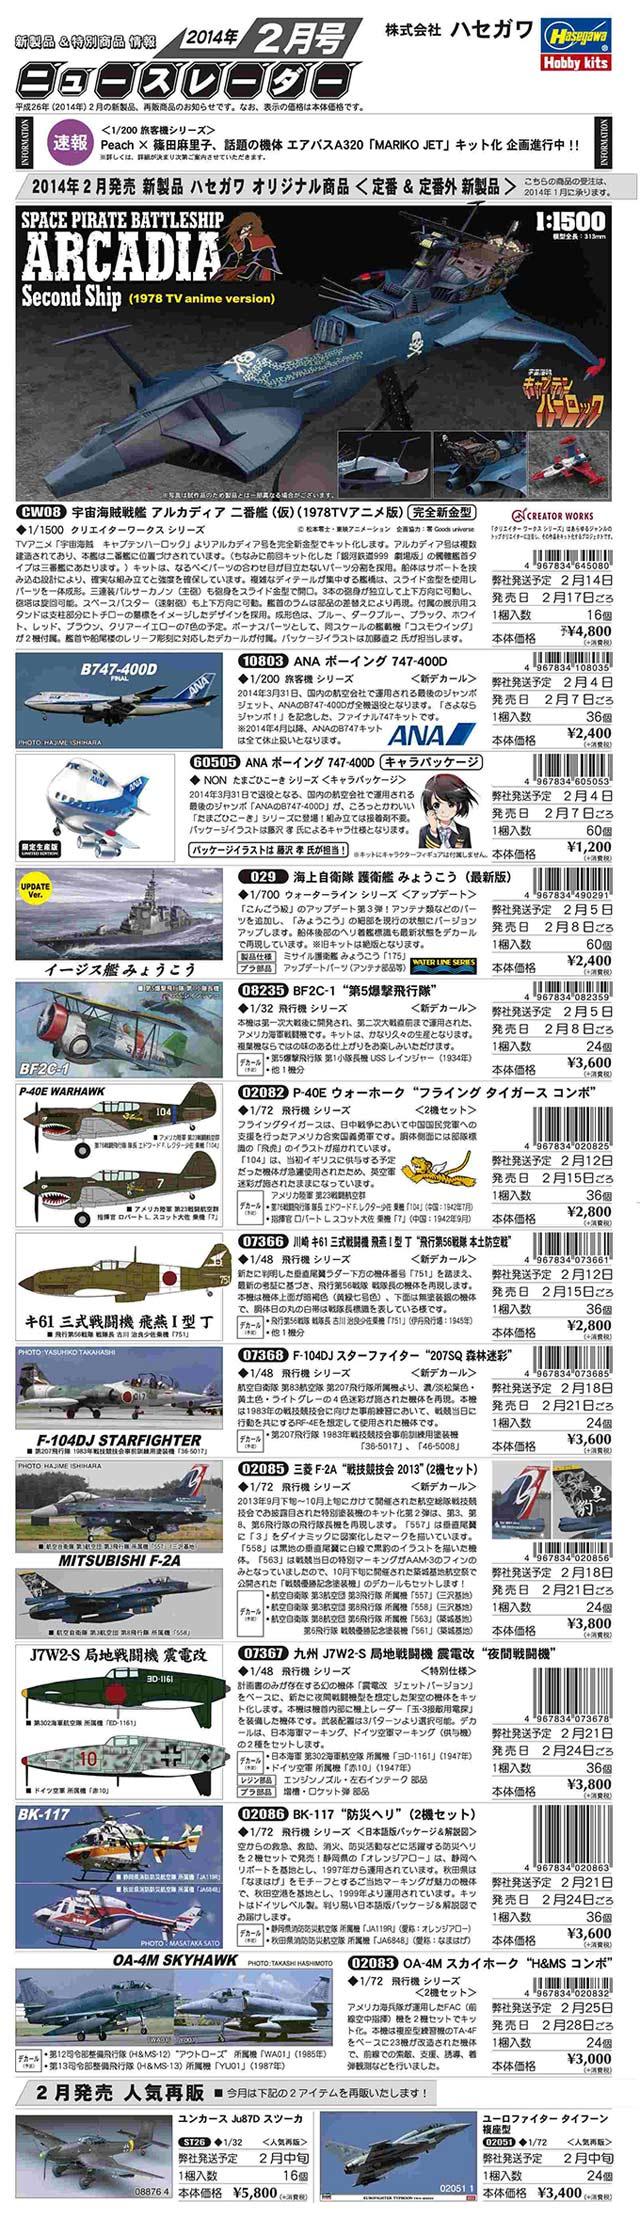 hasegawa-Nr26-2.jpg